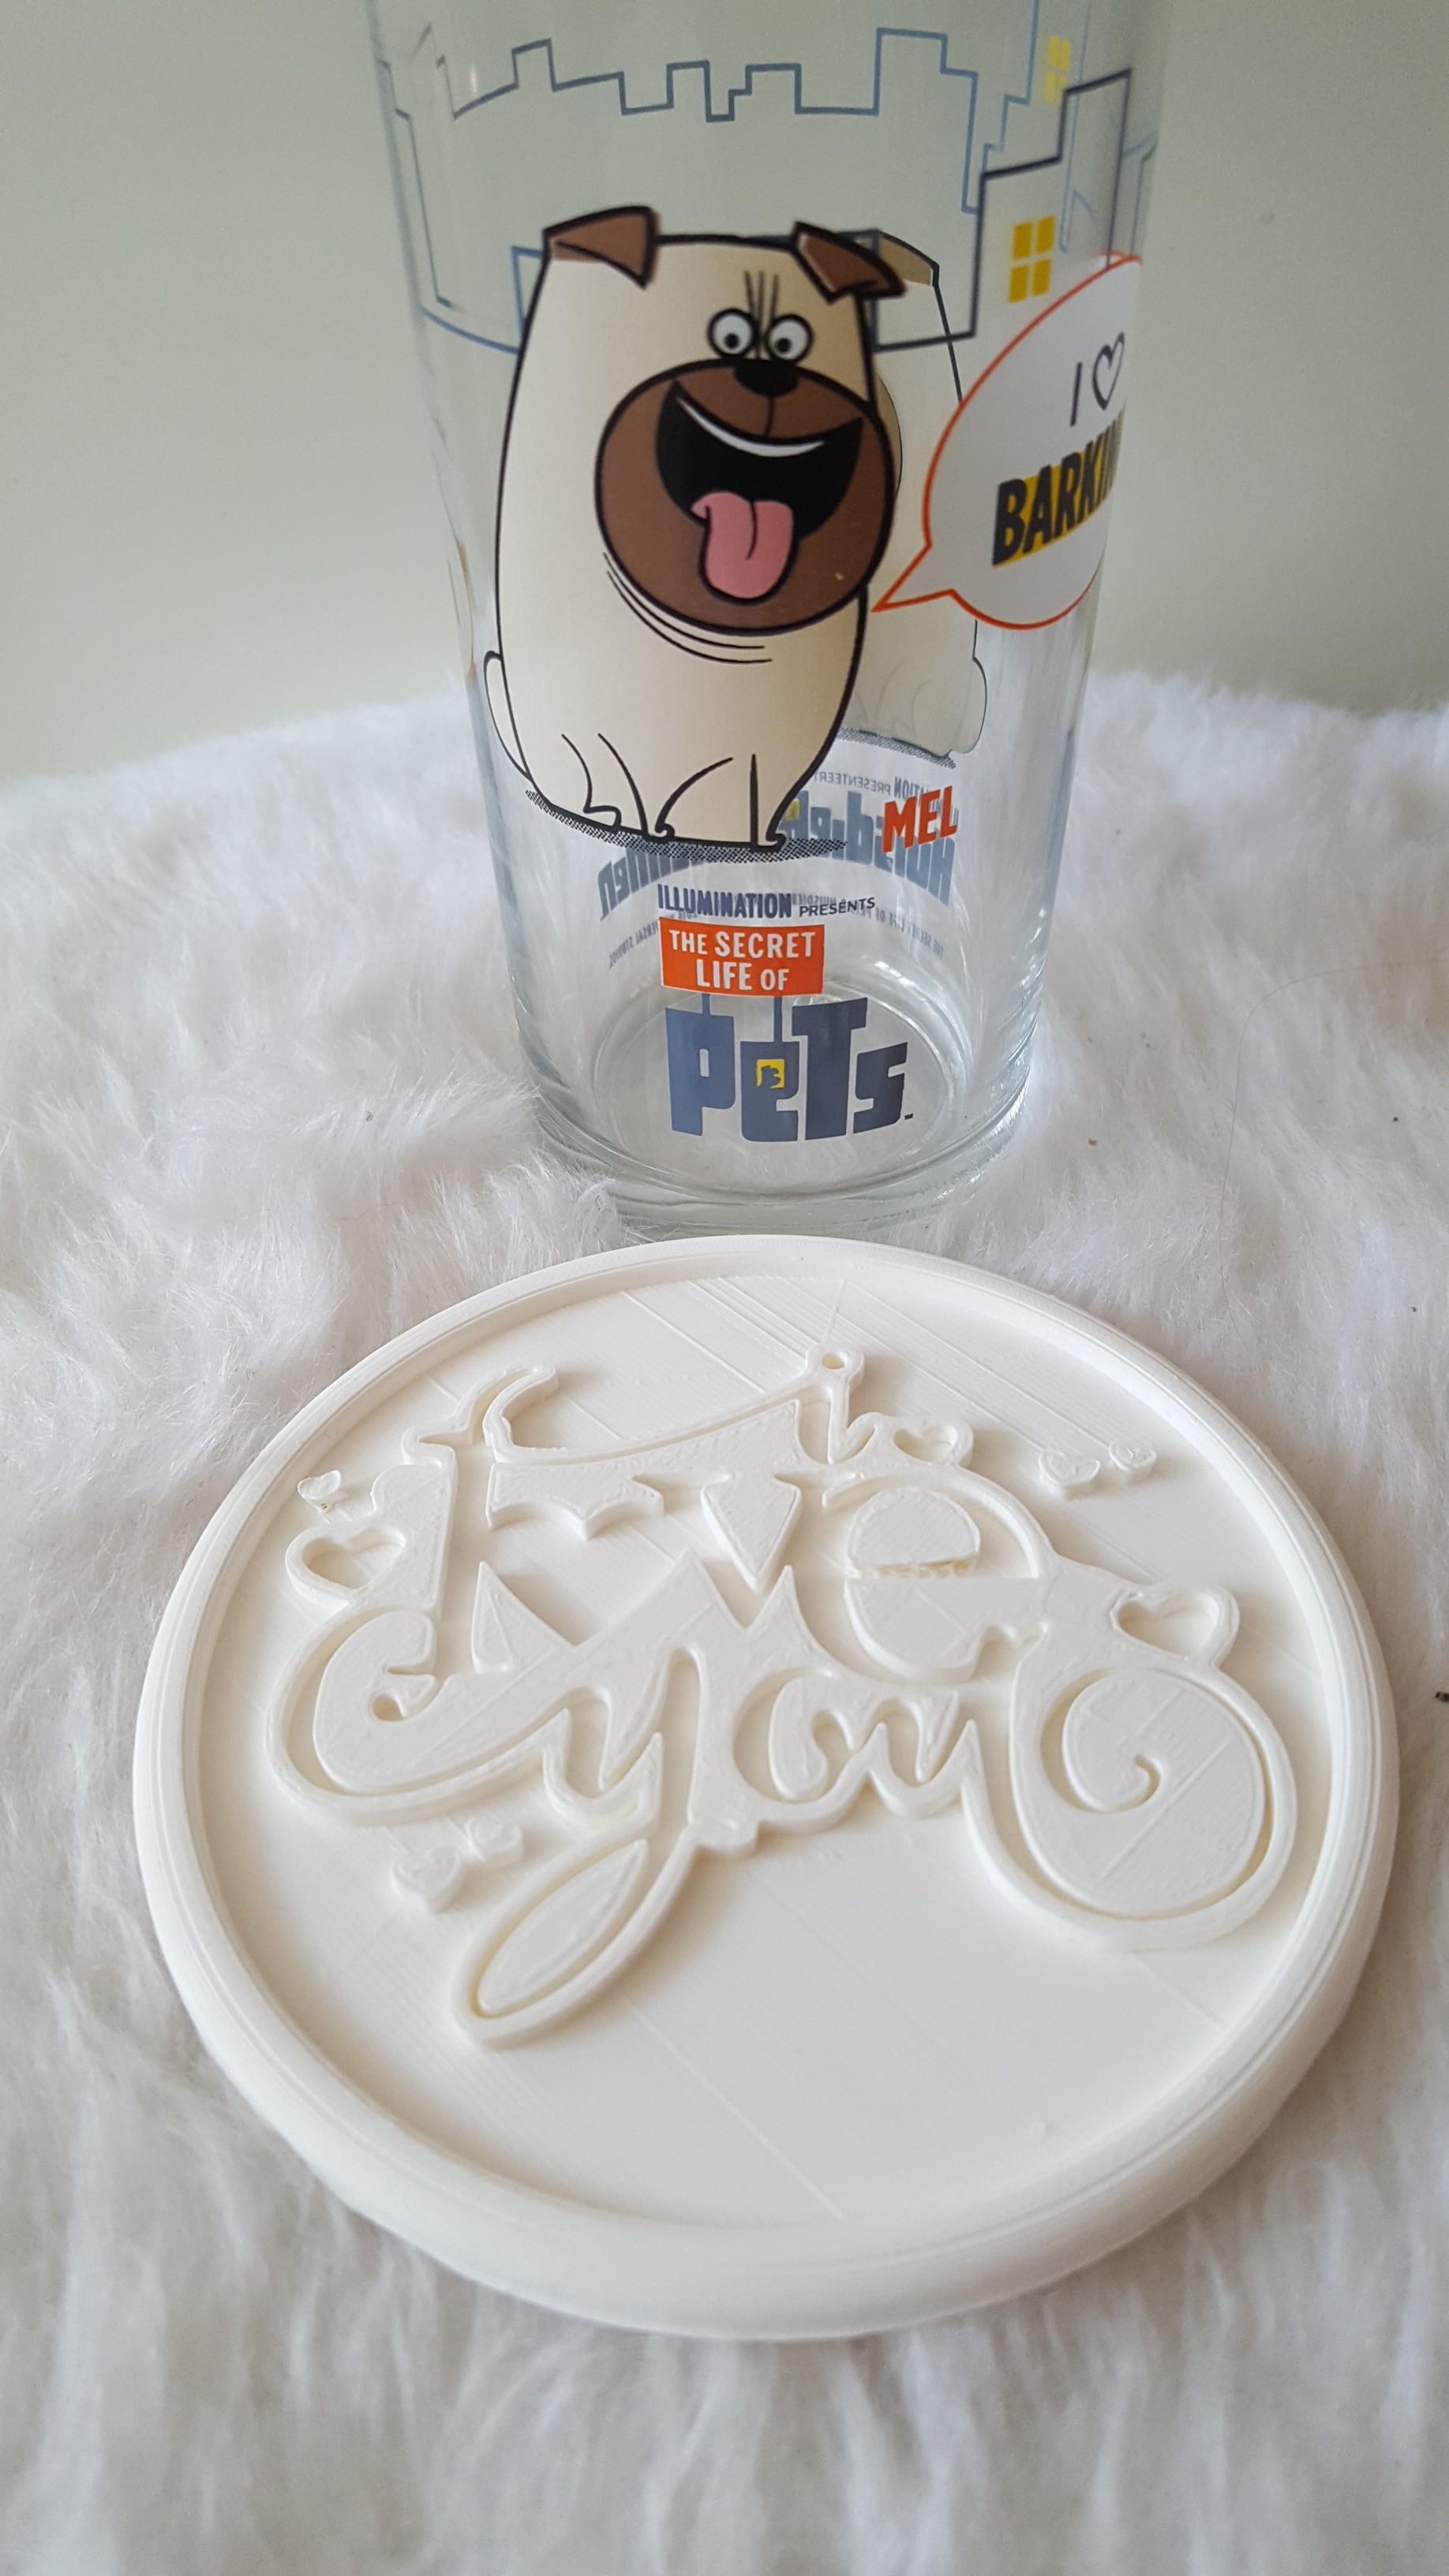 20190324_134045.jpg Download free STL file I love you drinkcoaster • 3D print design, IdeaLab